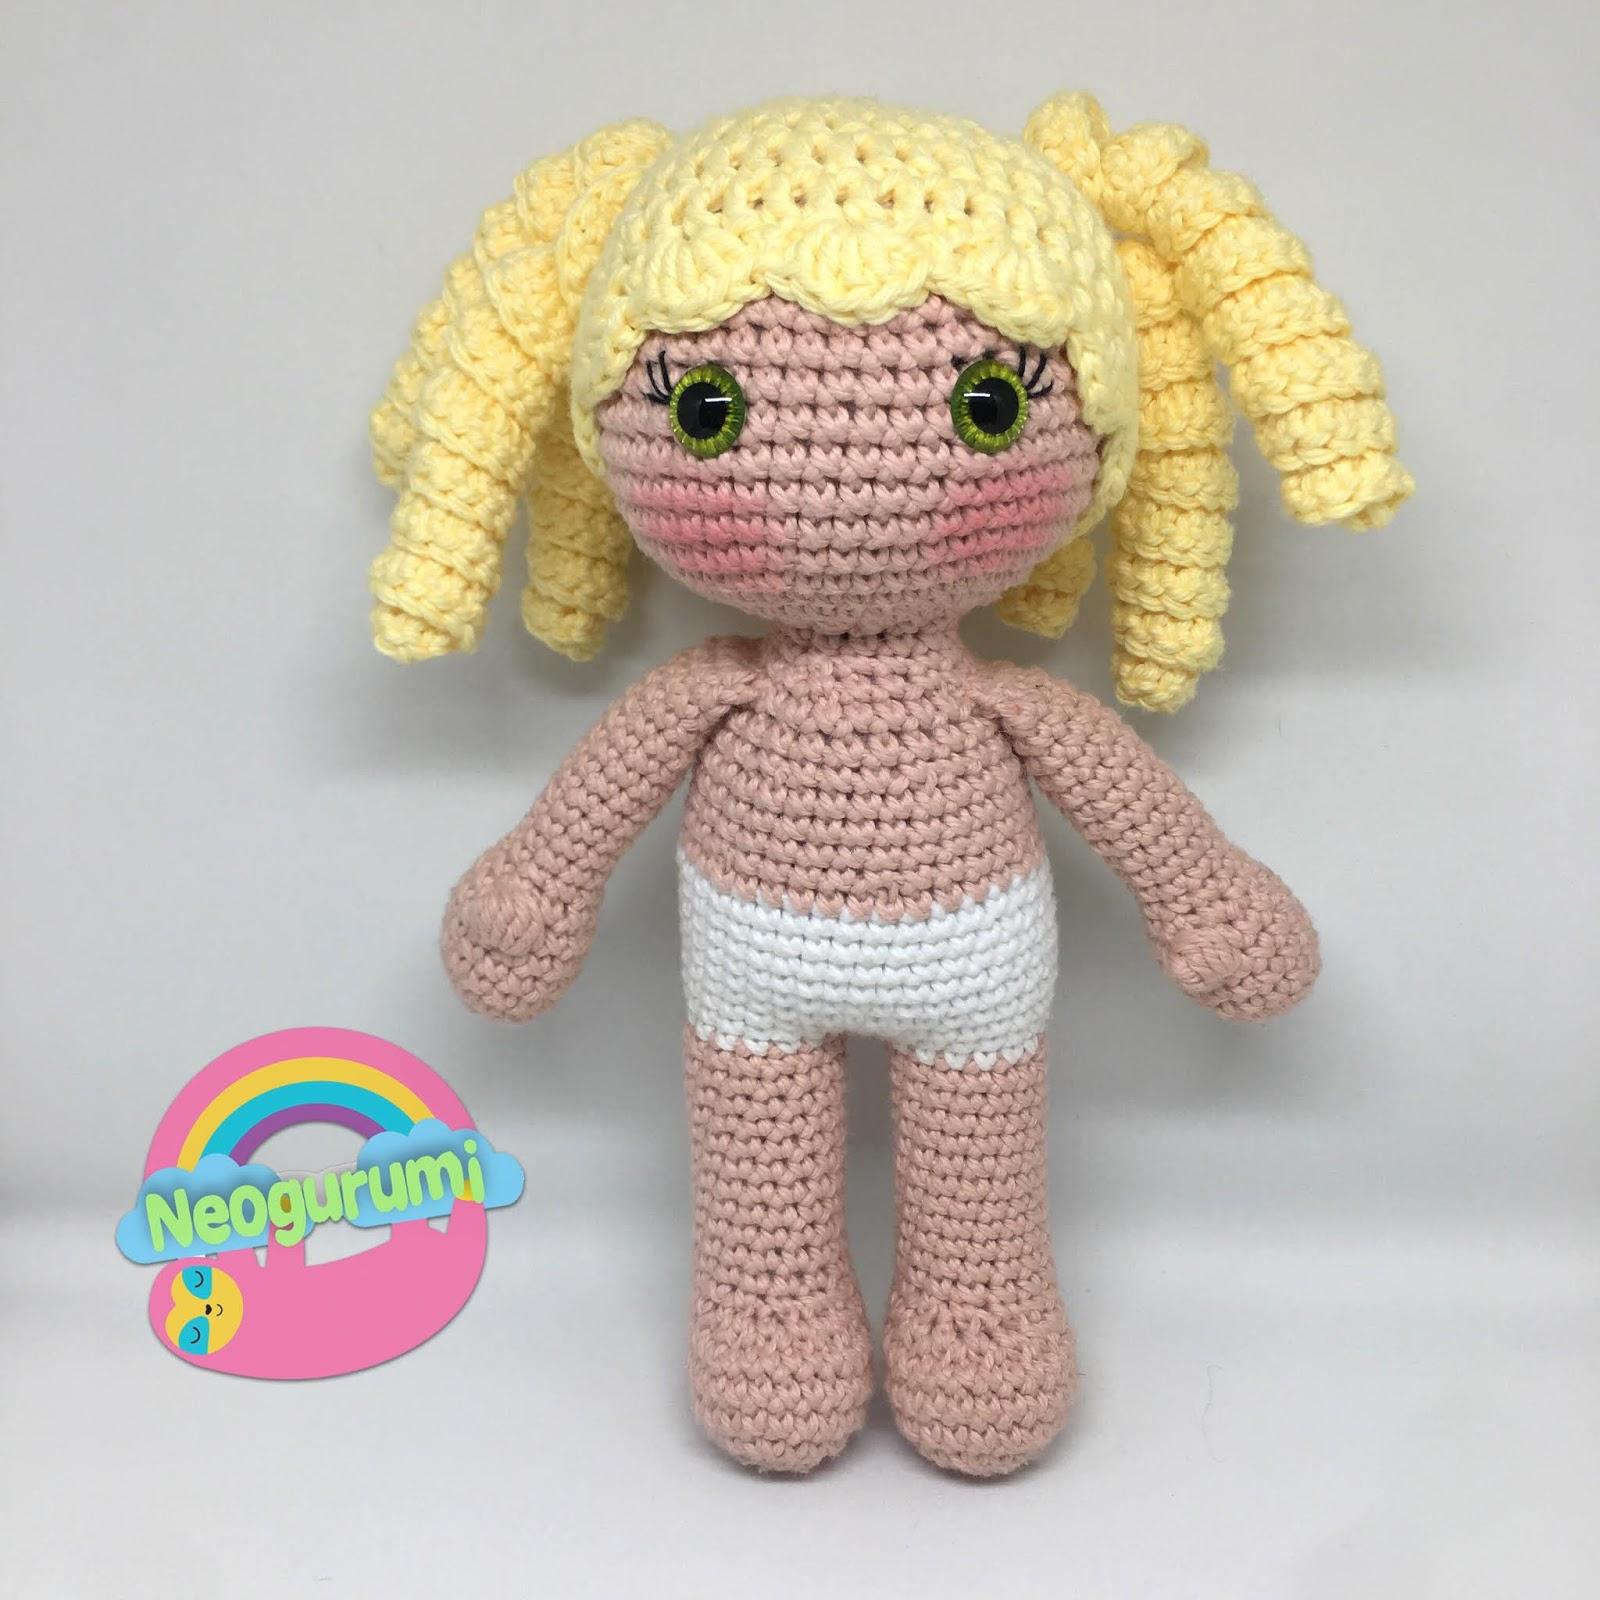 elegant-neogurumi-amigurumi-chloe-doll-cal-free-pattern-12 Amigurumi Chloe Doll Cal Ücretsiz Desen